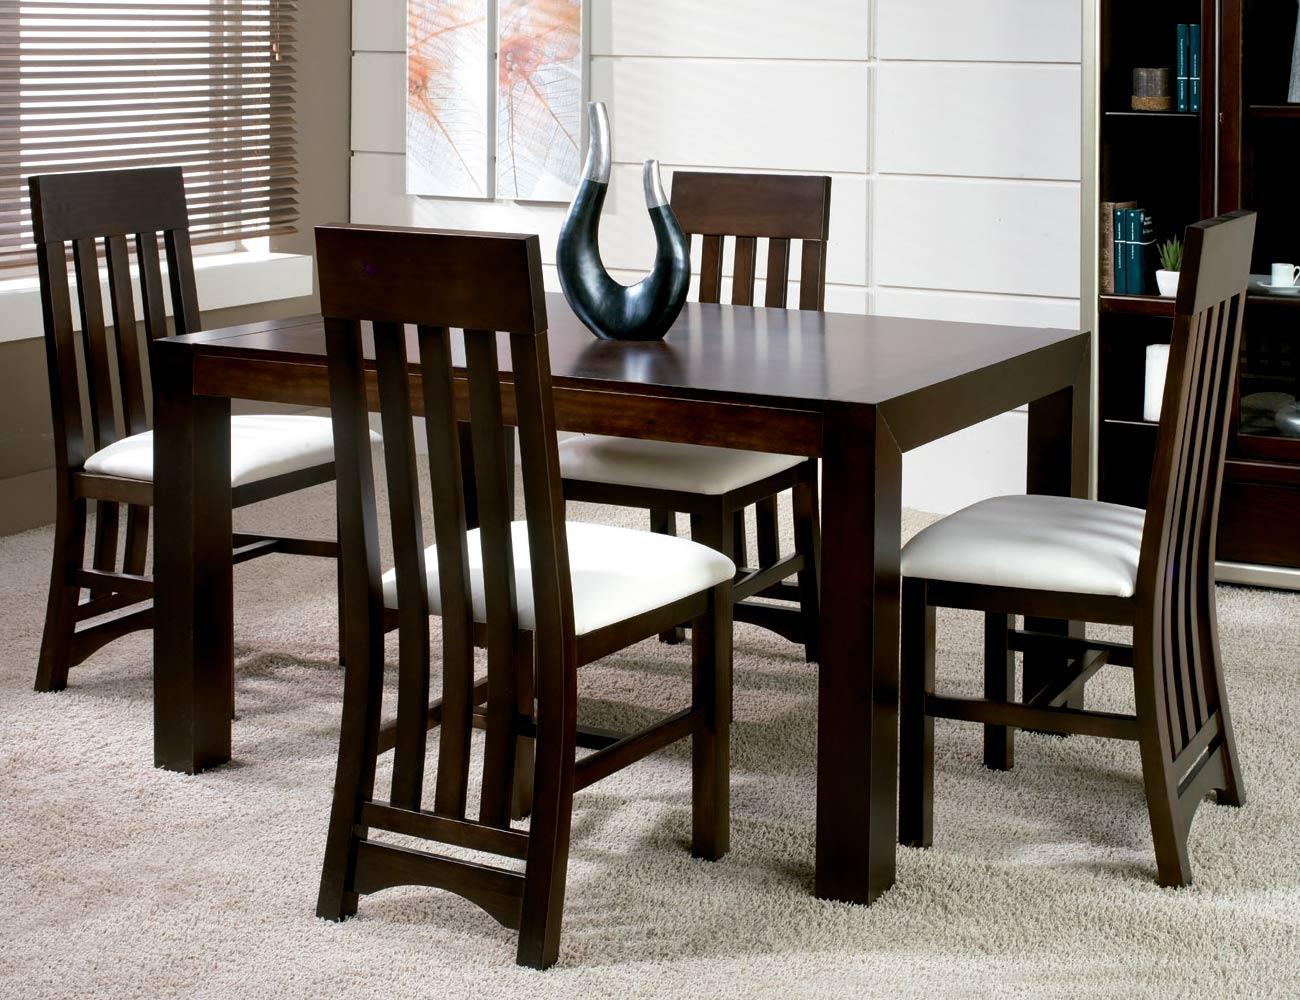 Composicion14 mesa sillas2